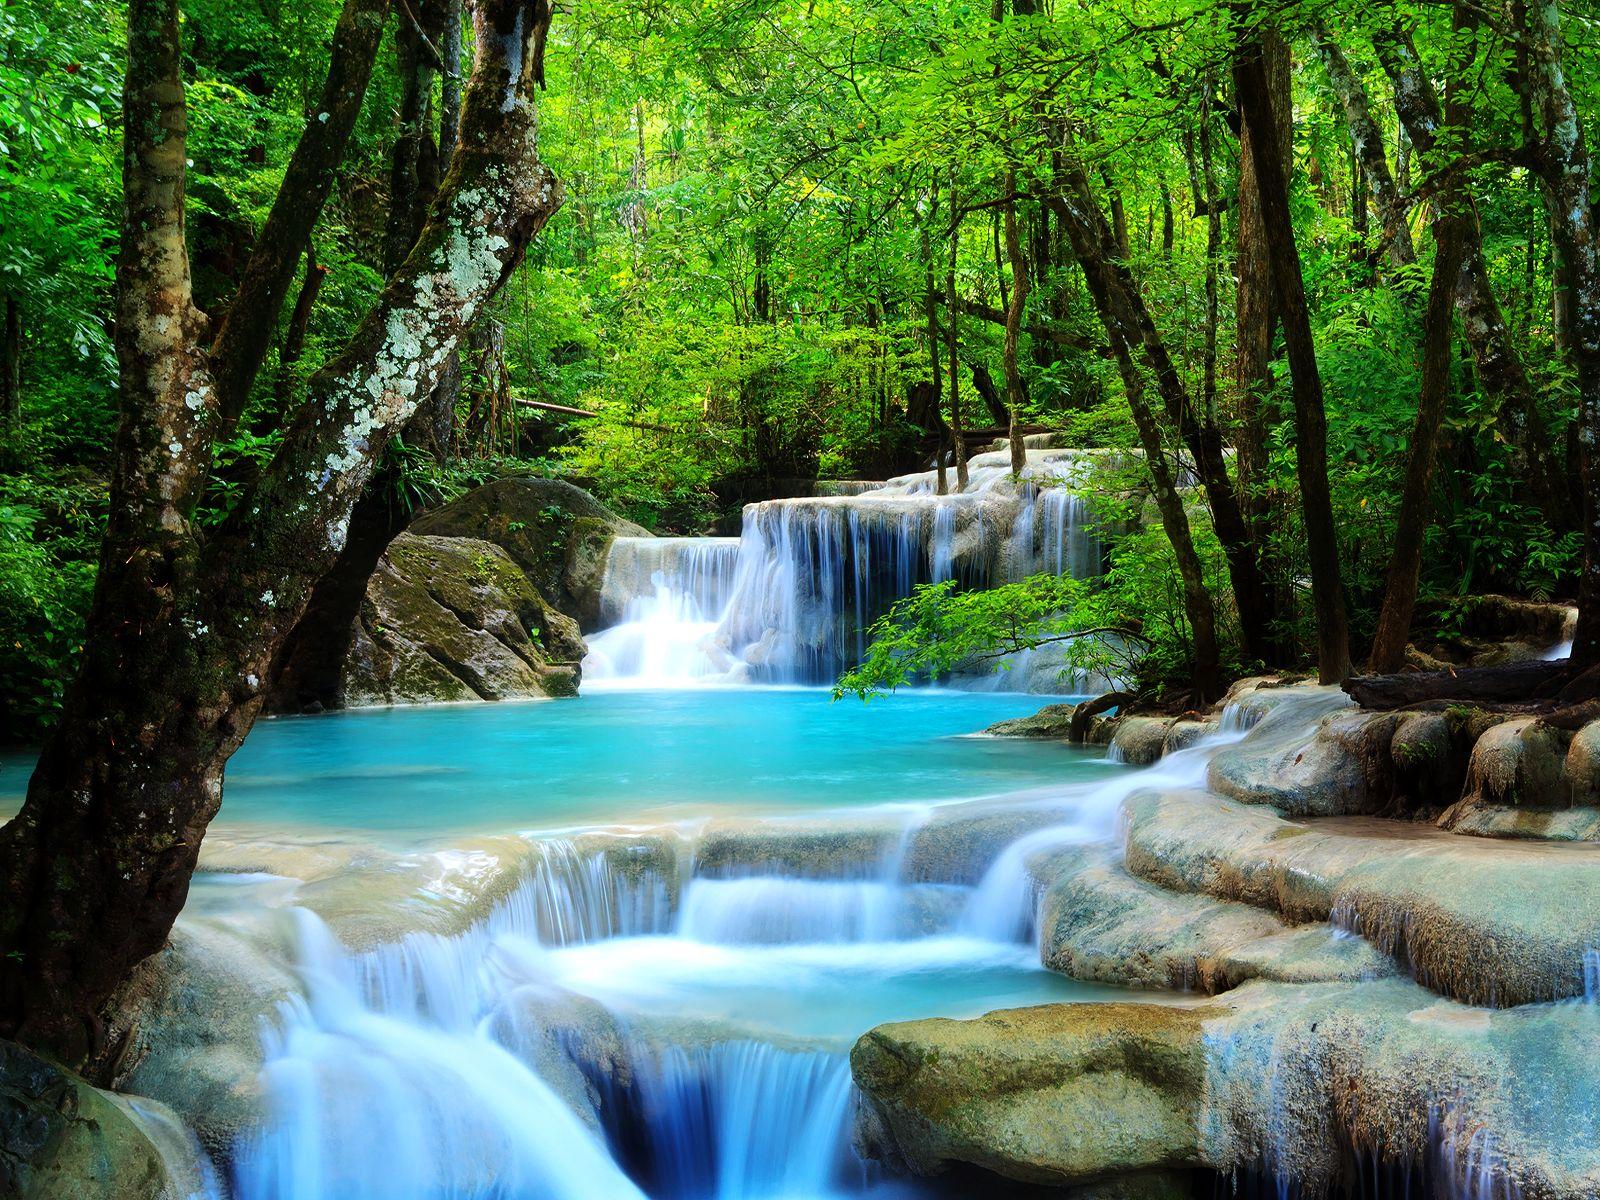 Beautiful-Waterfall. Rainforest Waterfall Wallpaper 01